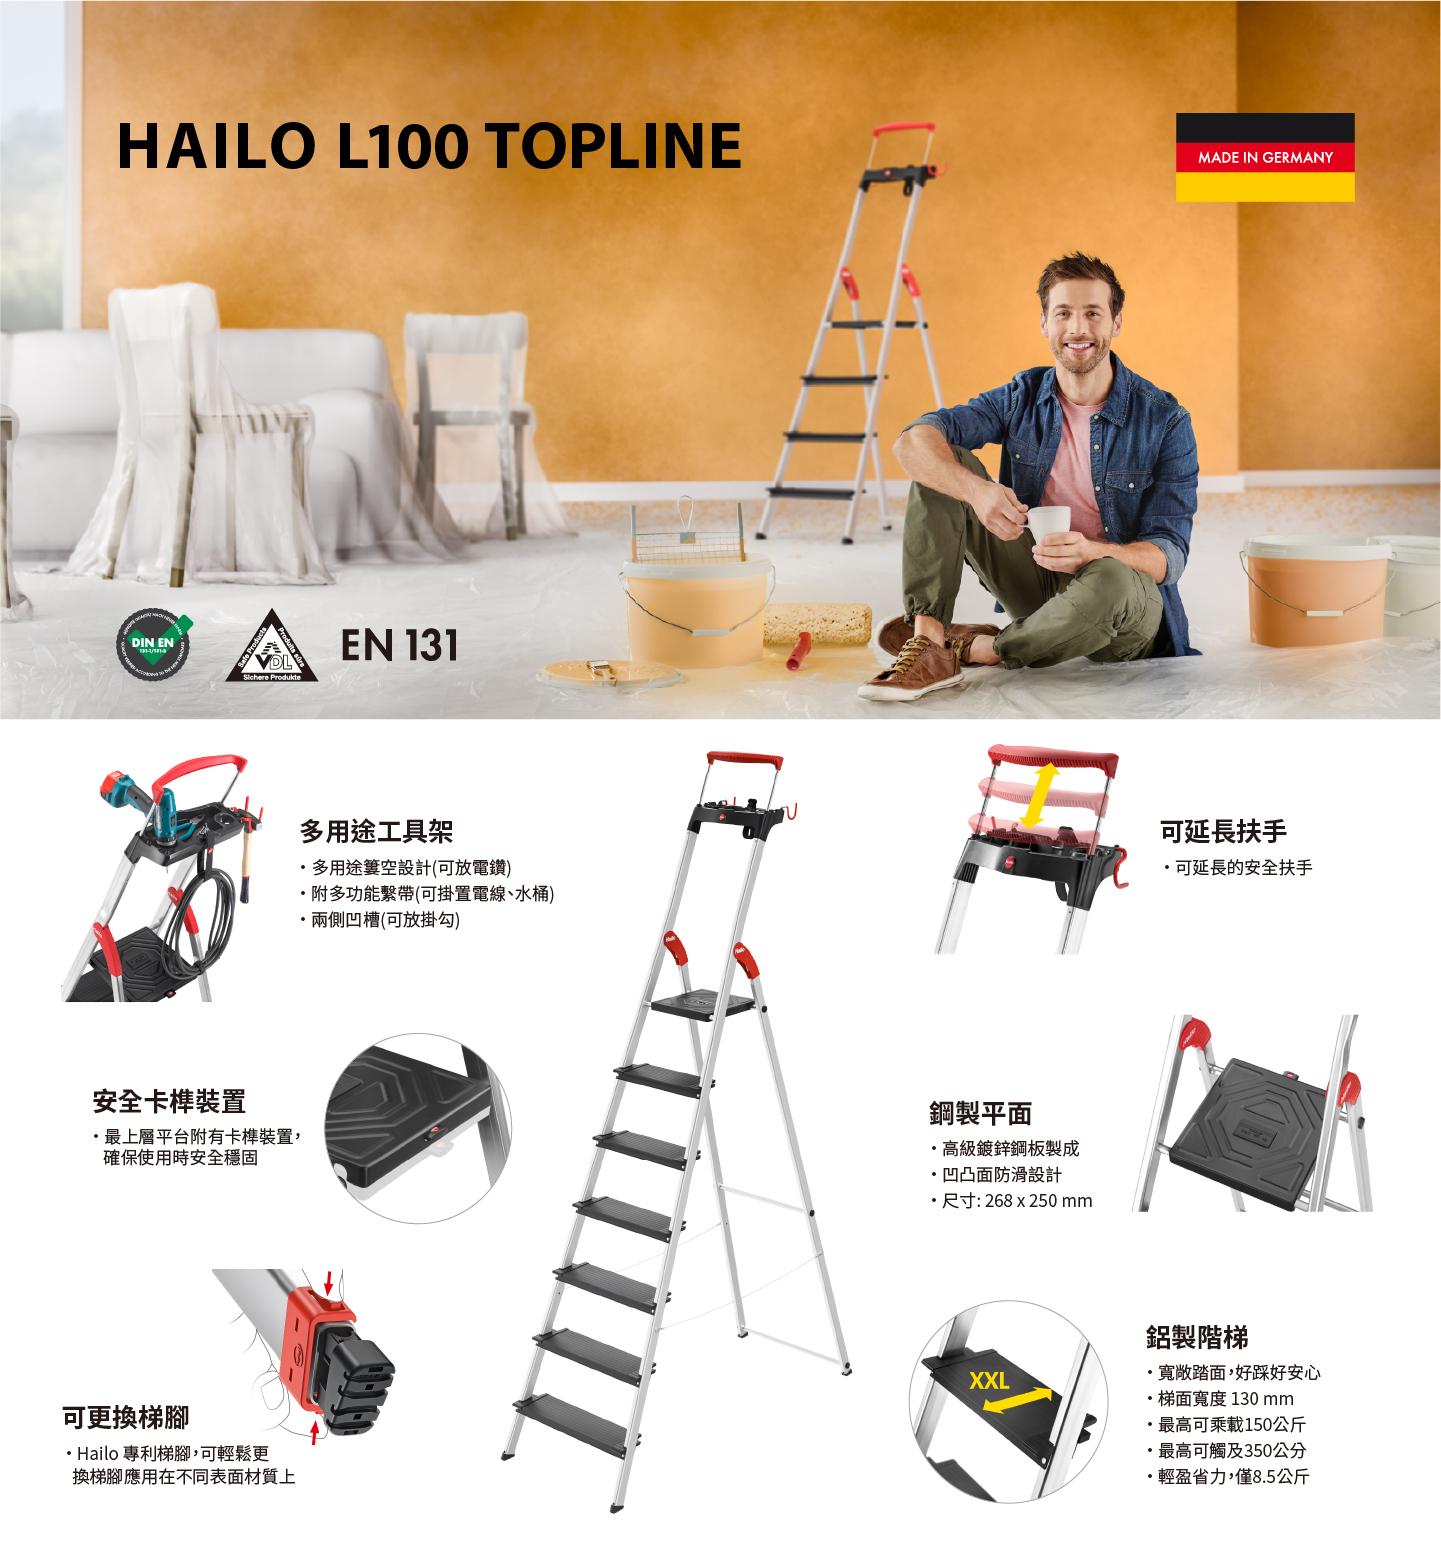 Hailo-L100Topline-7steps